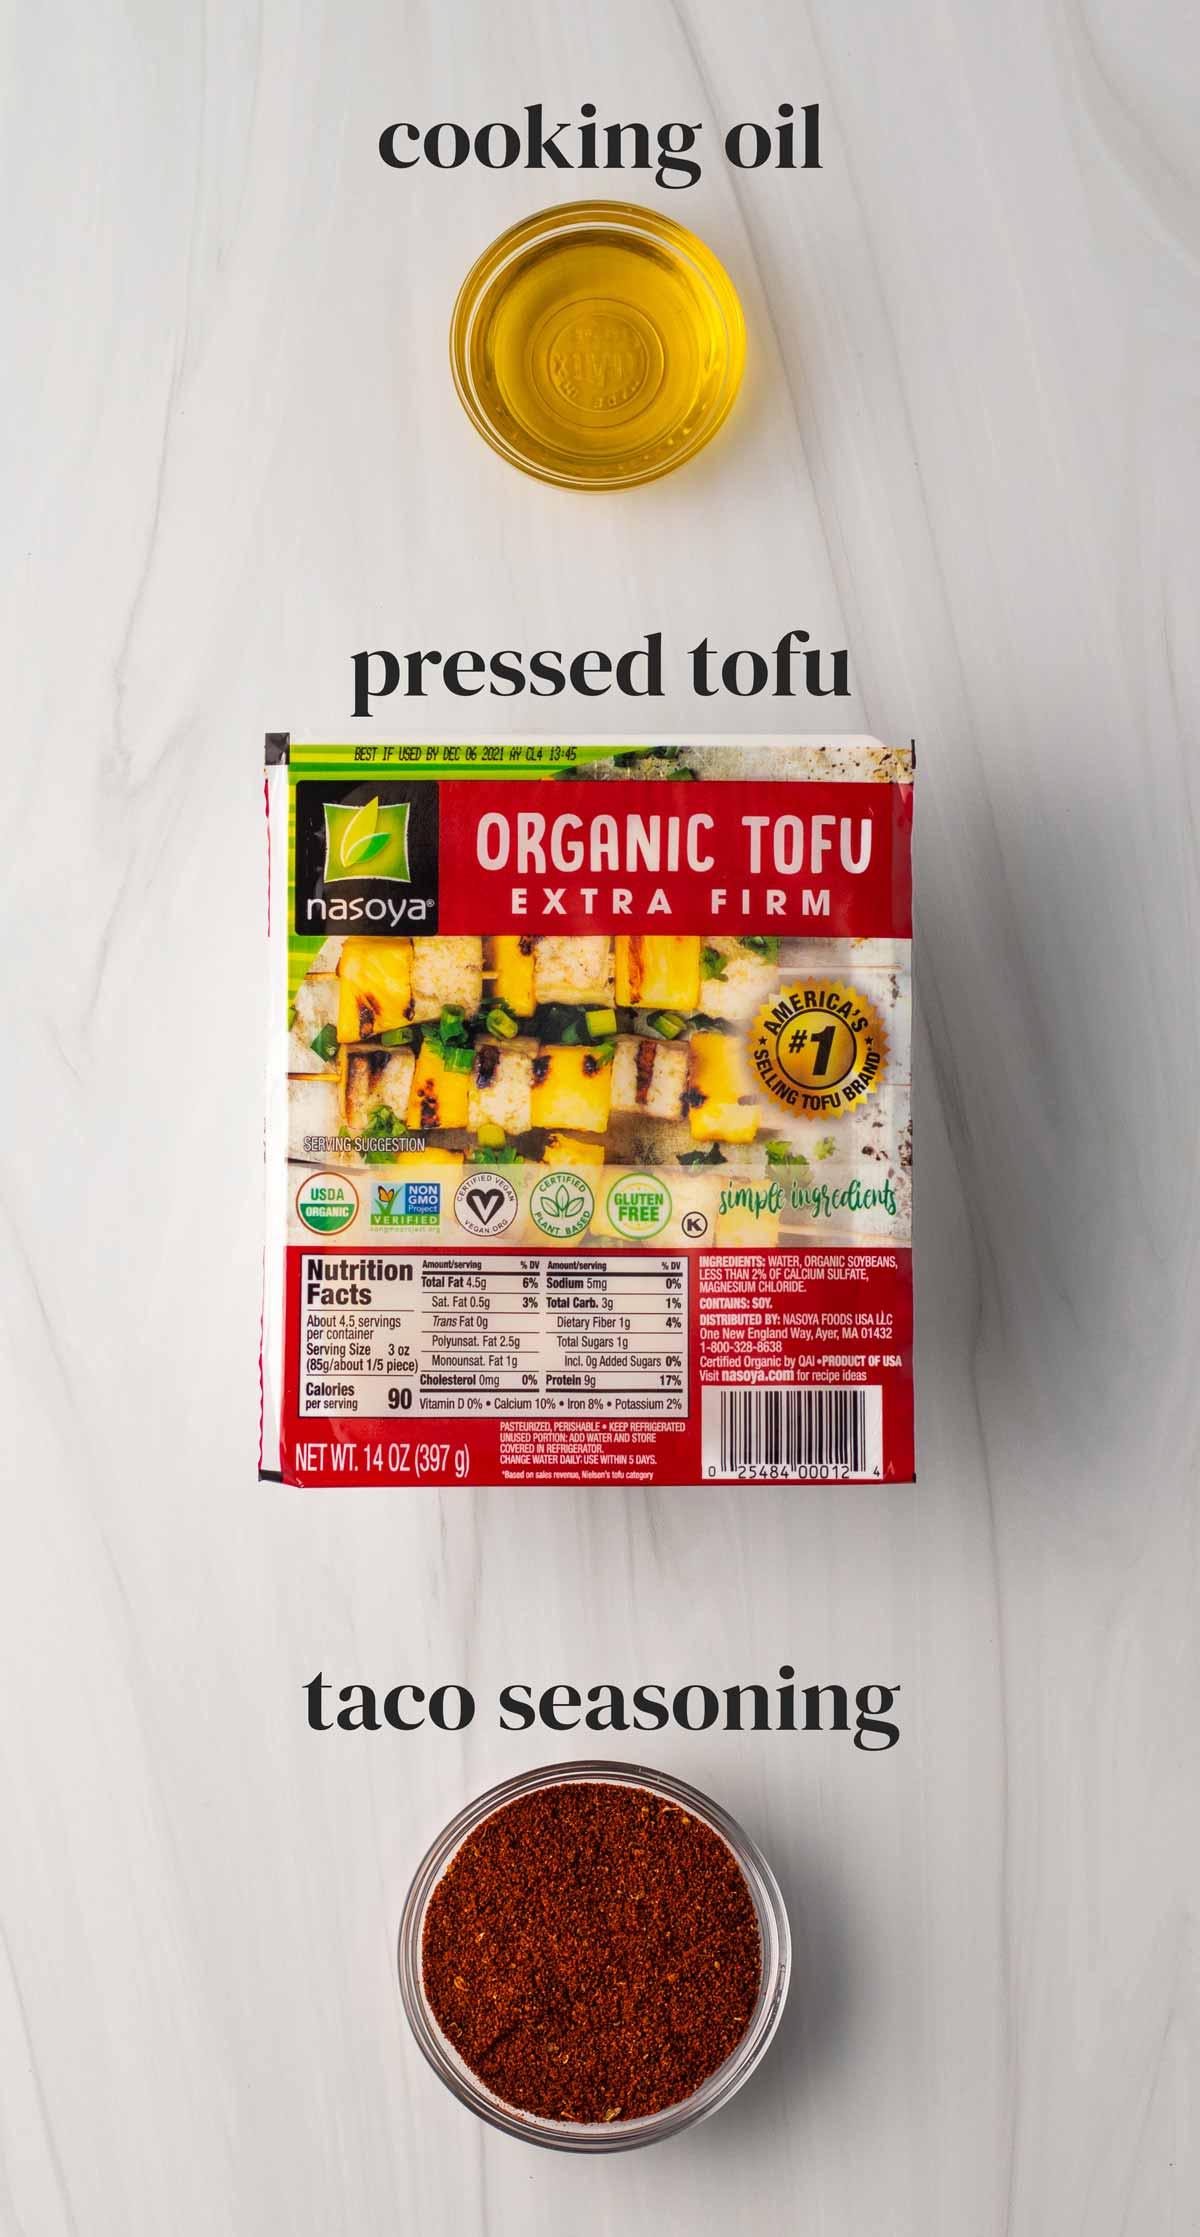 cooking oil, tofu and taco seasoning